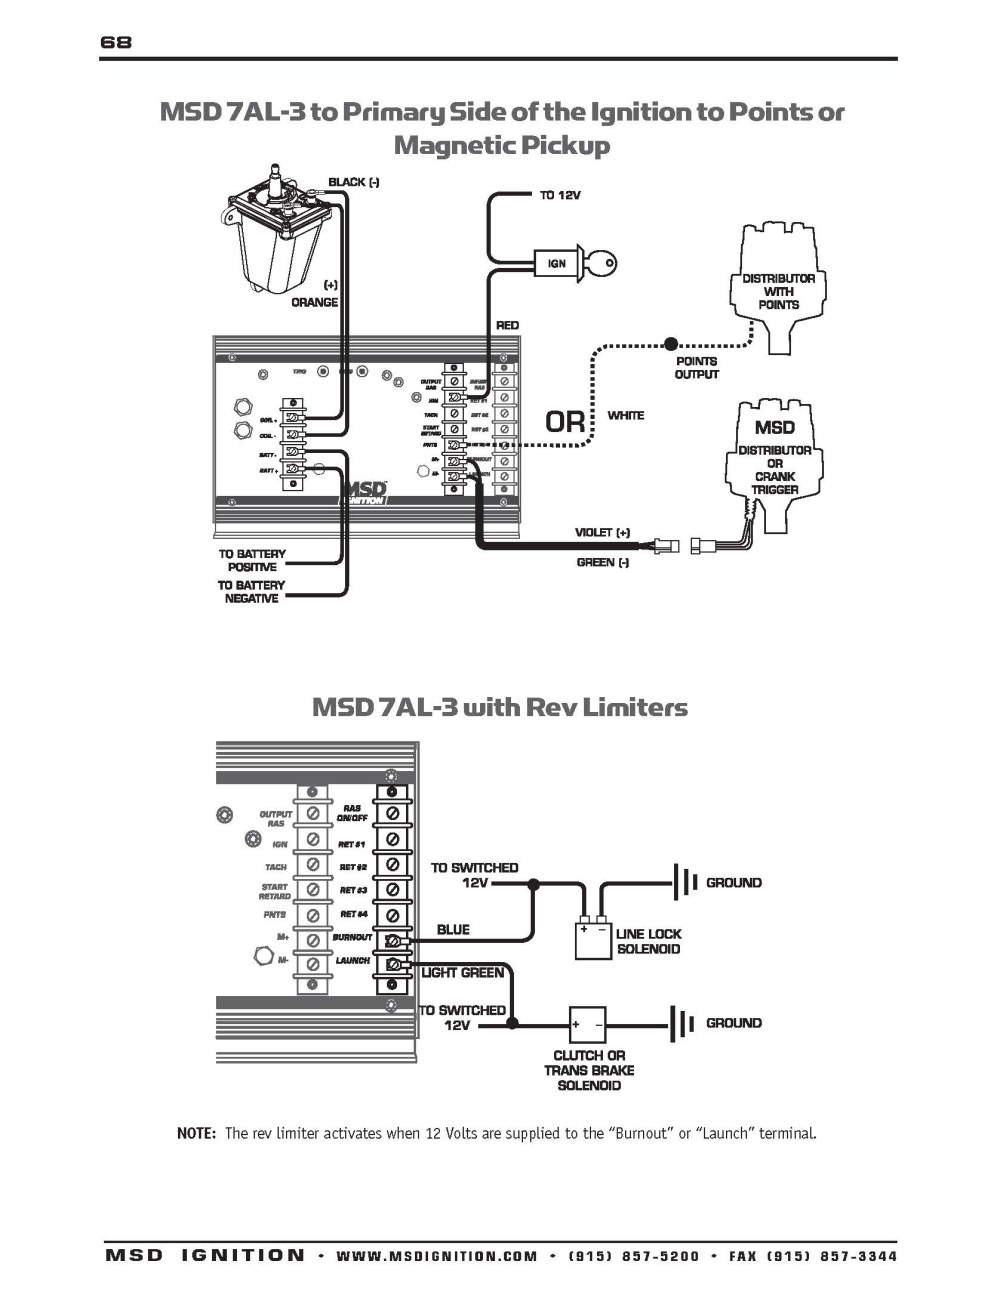 medium resolution of msd 7al 3 wiring diagram chevy wiring diagram online chevy heimsd 7al 3 wiring diagram chevy